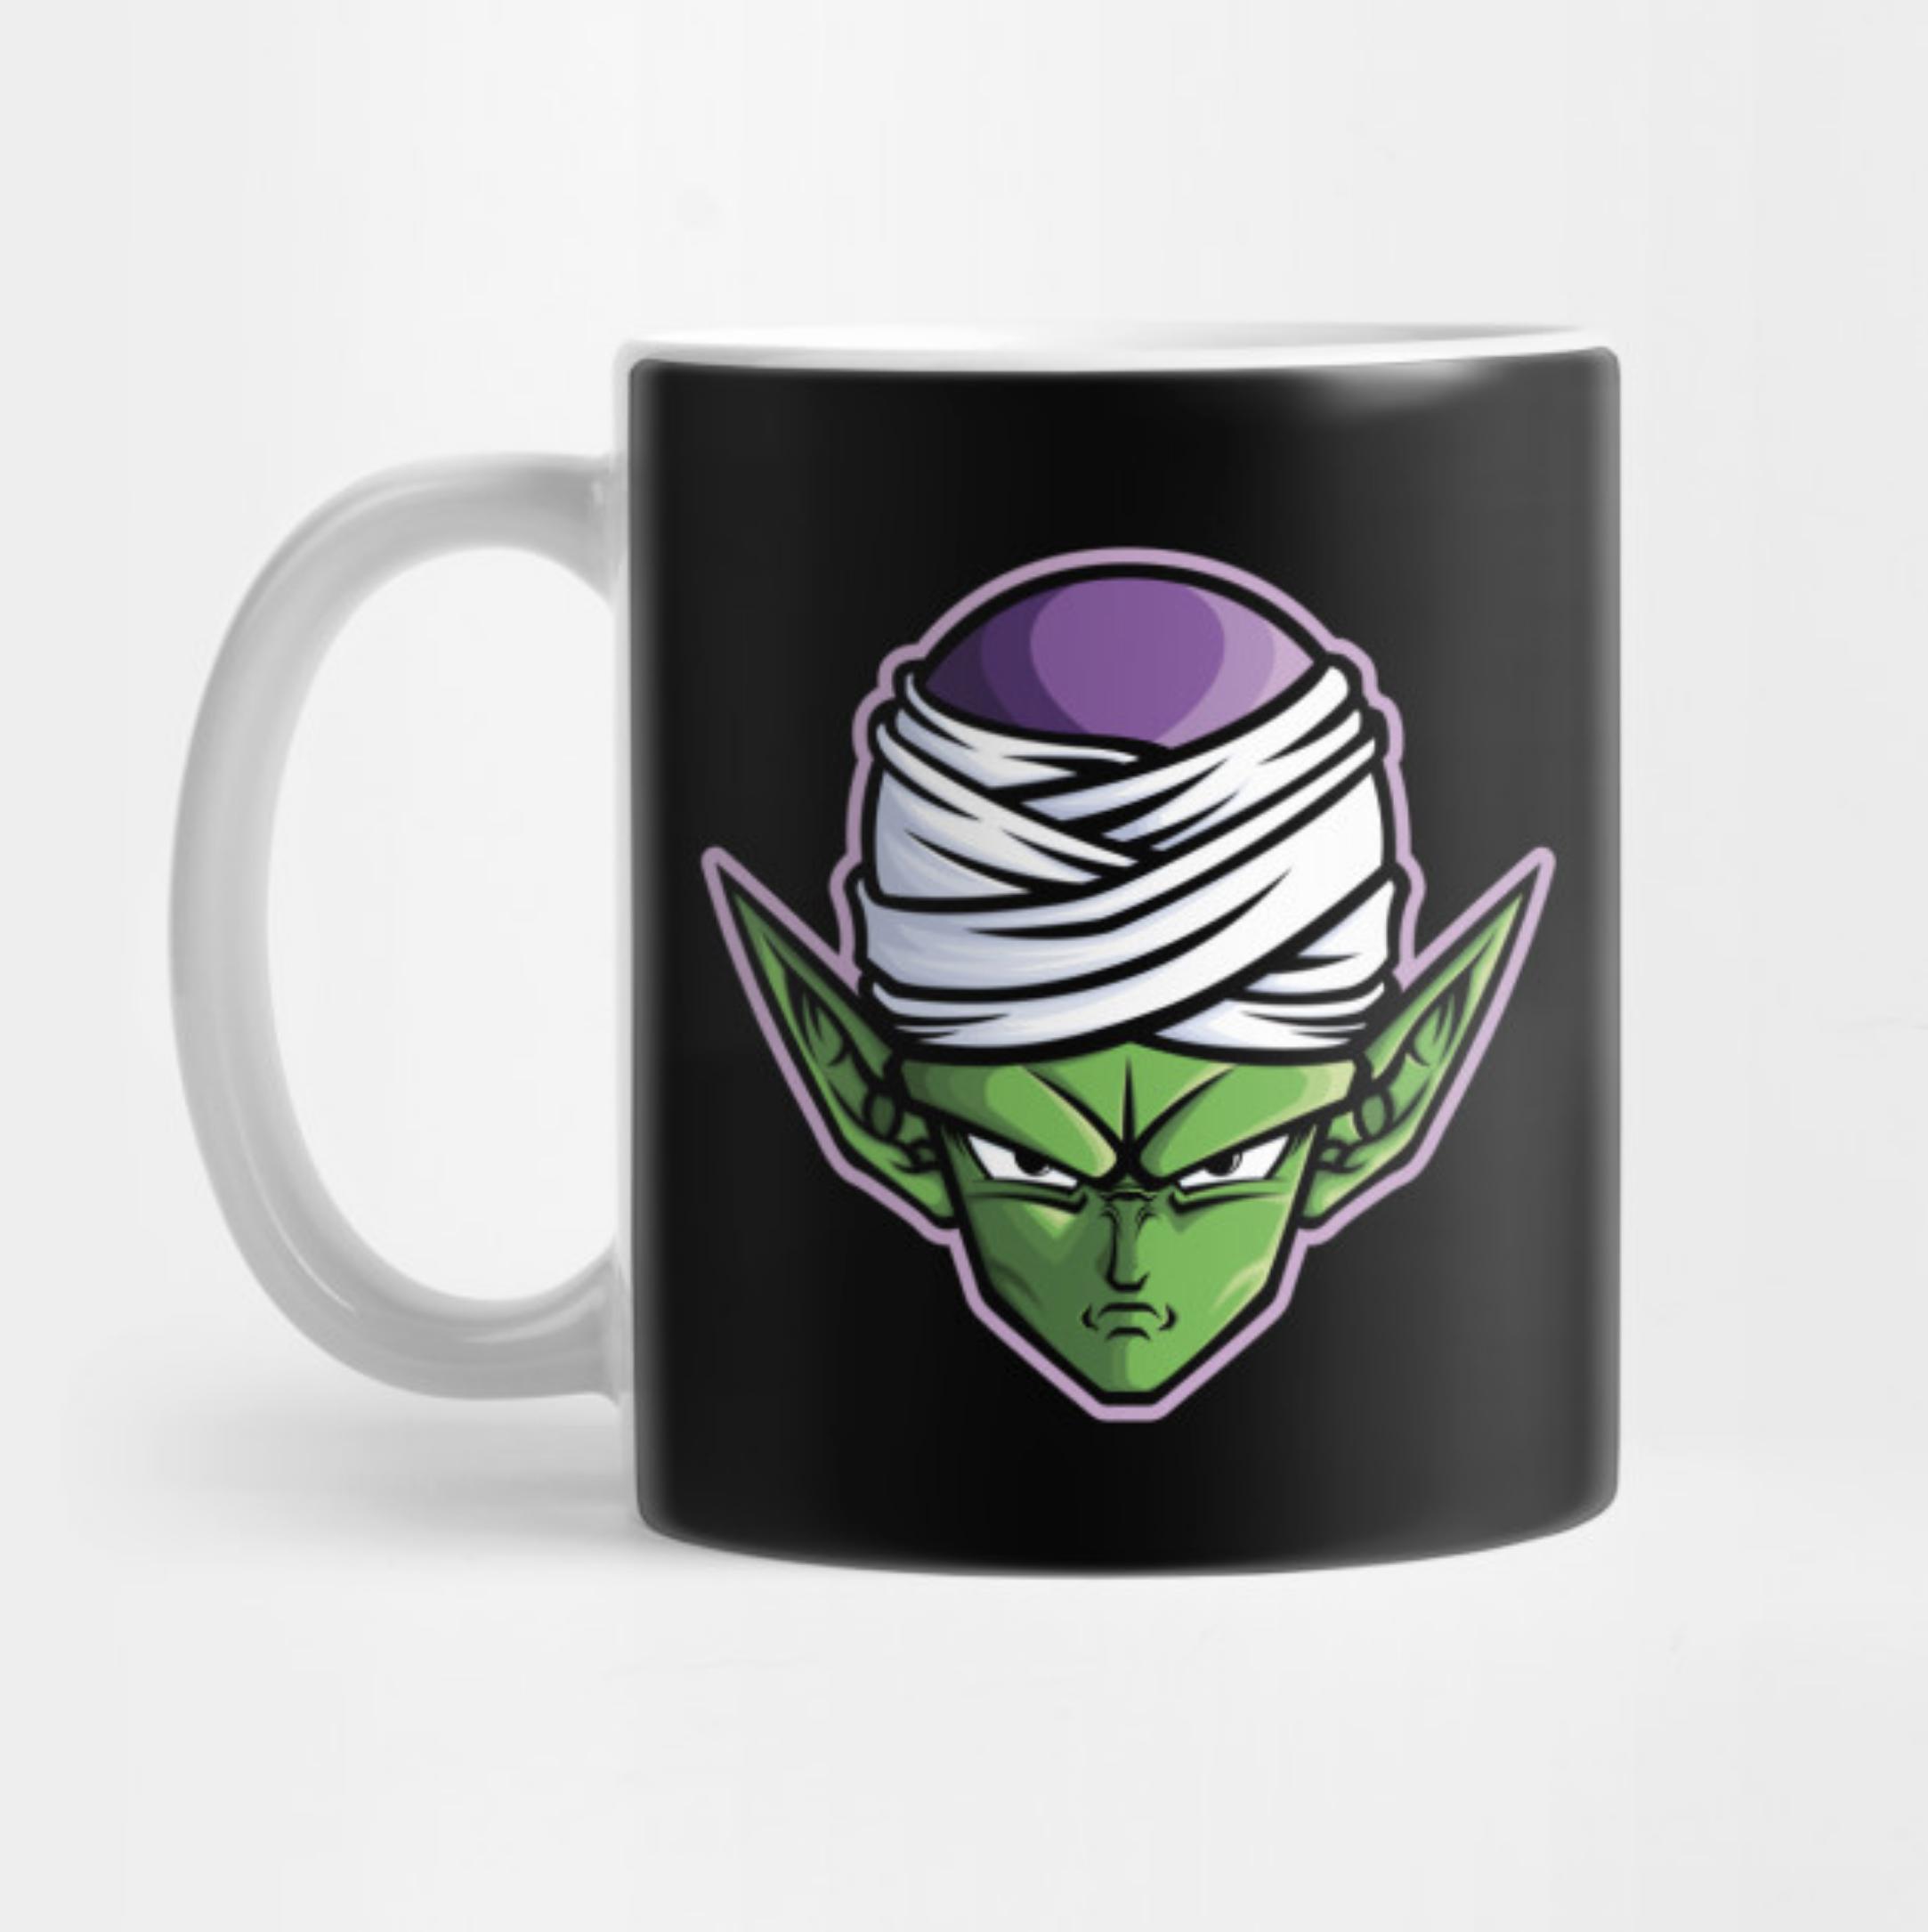 dragonballz-piccolo-teepublic-mug.png